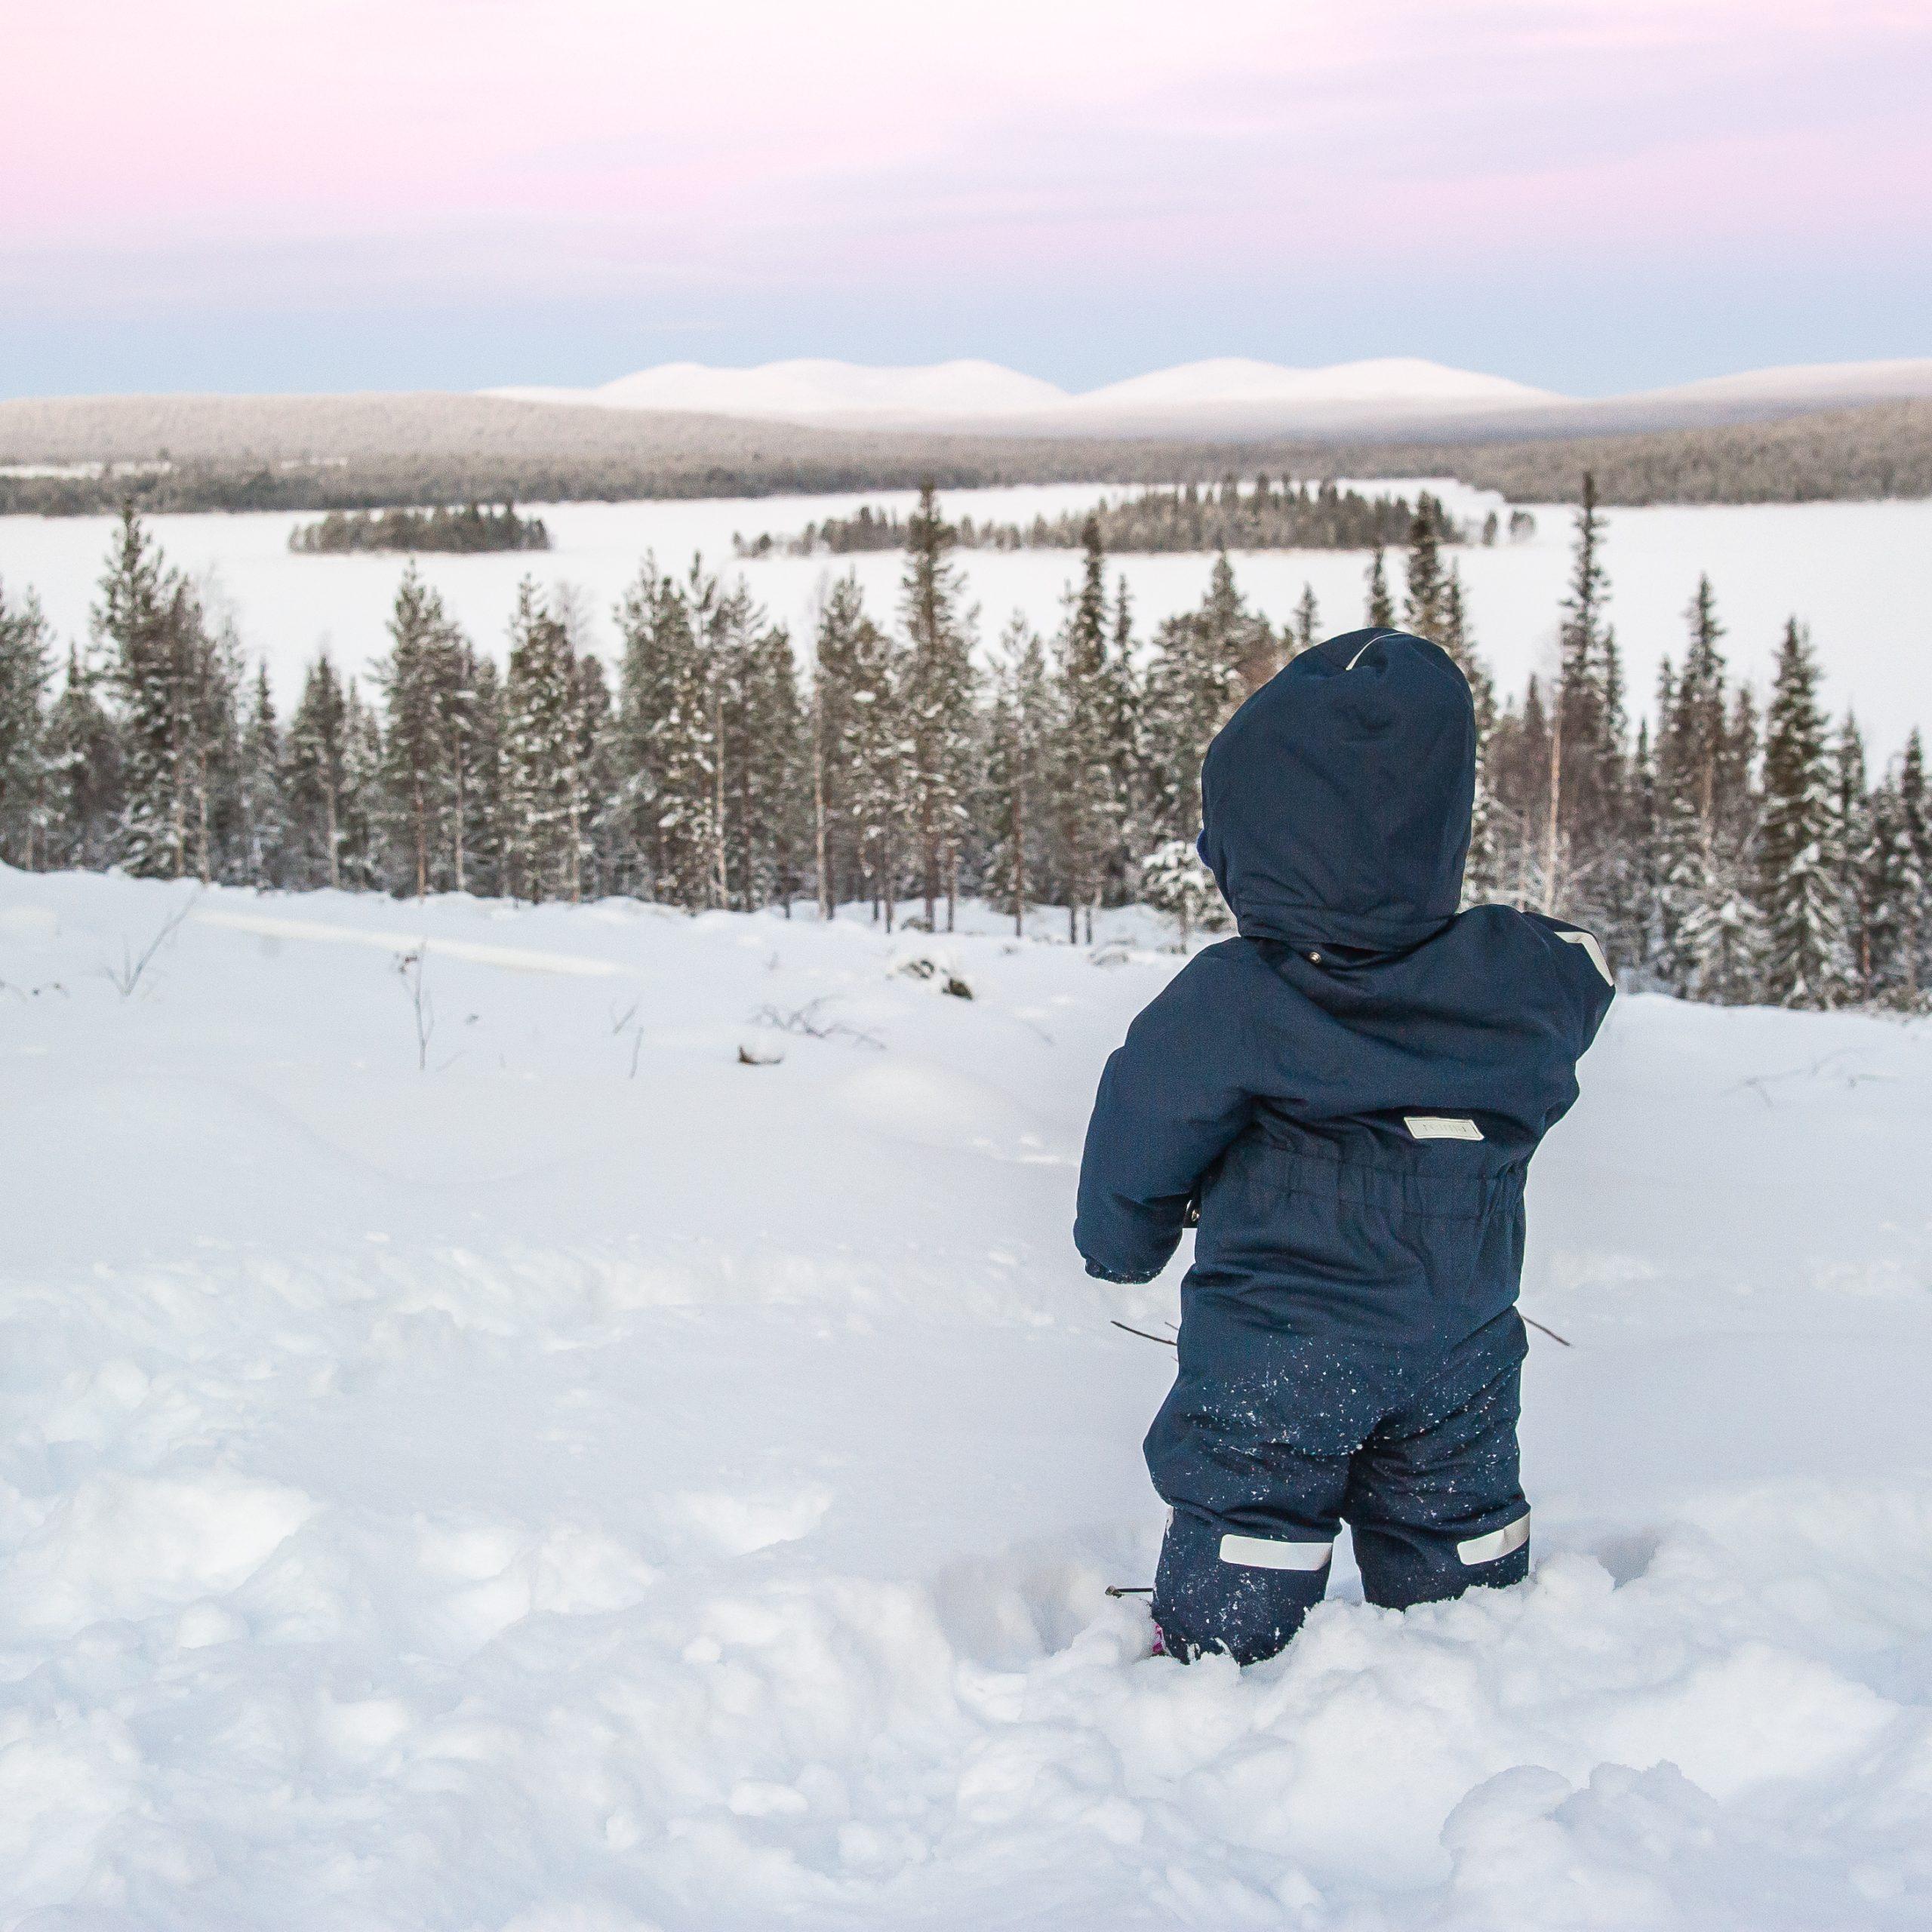 Boy looking at pallas fells